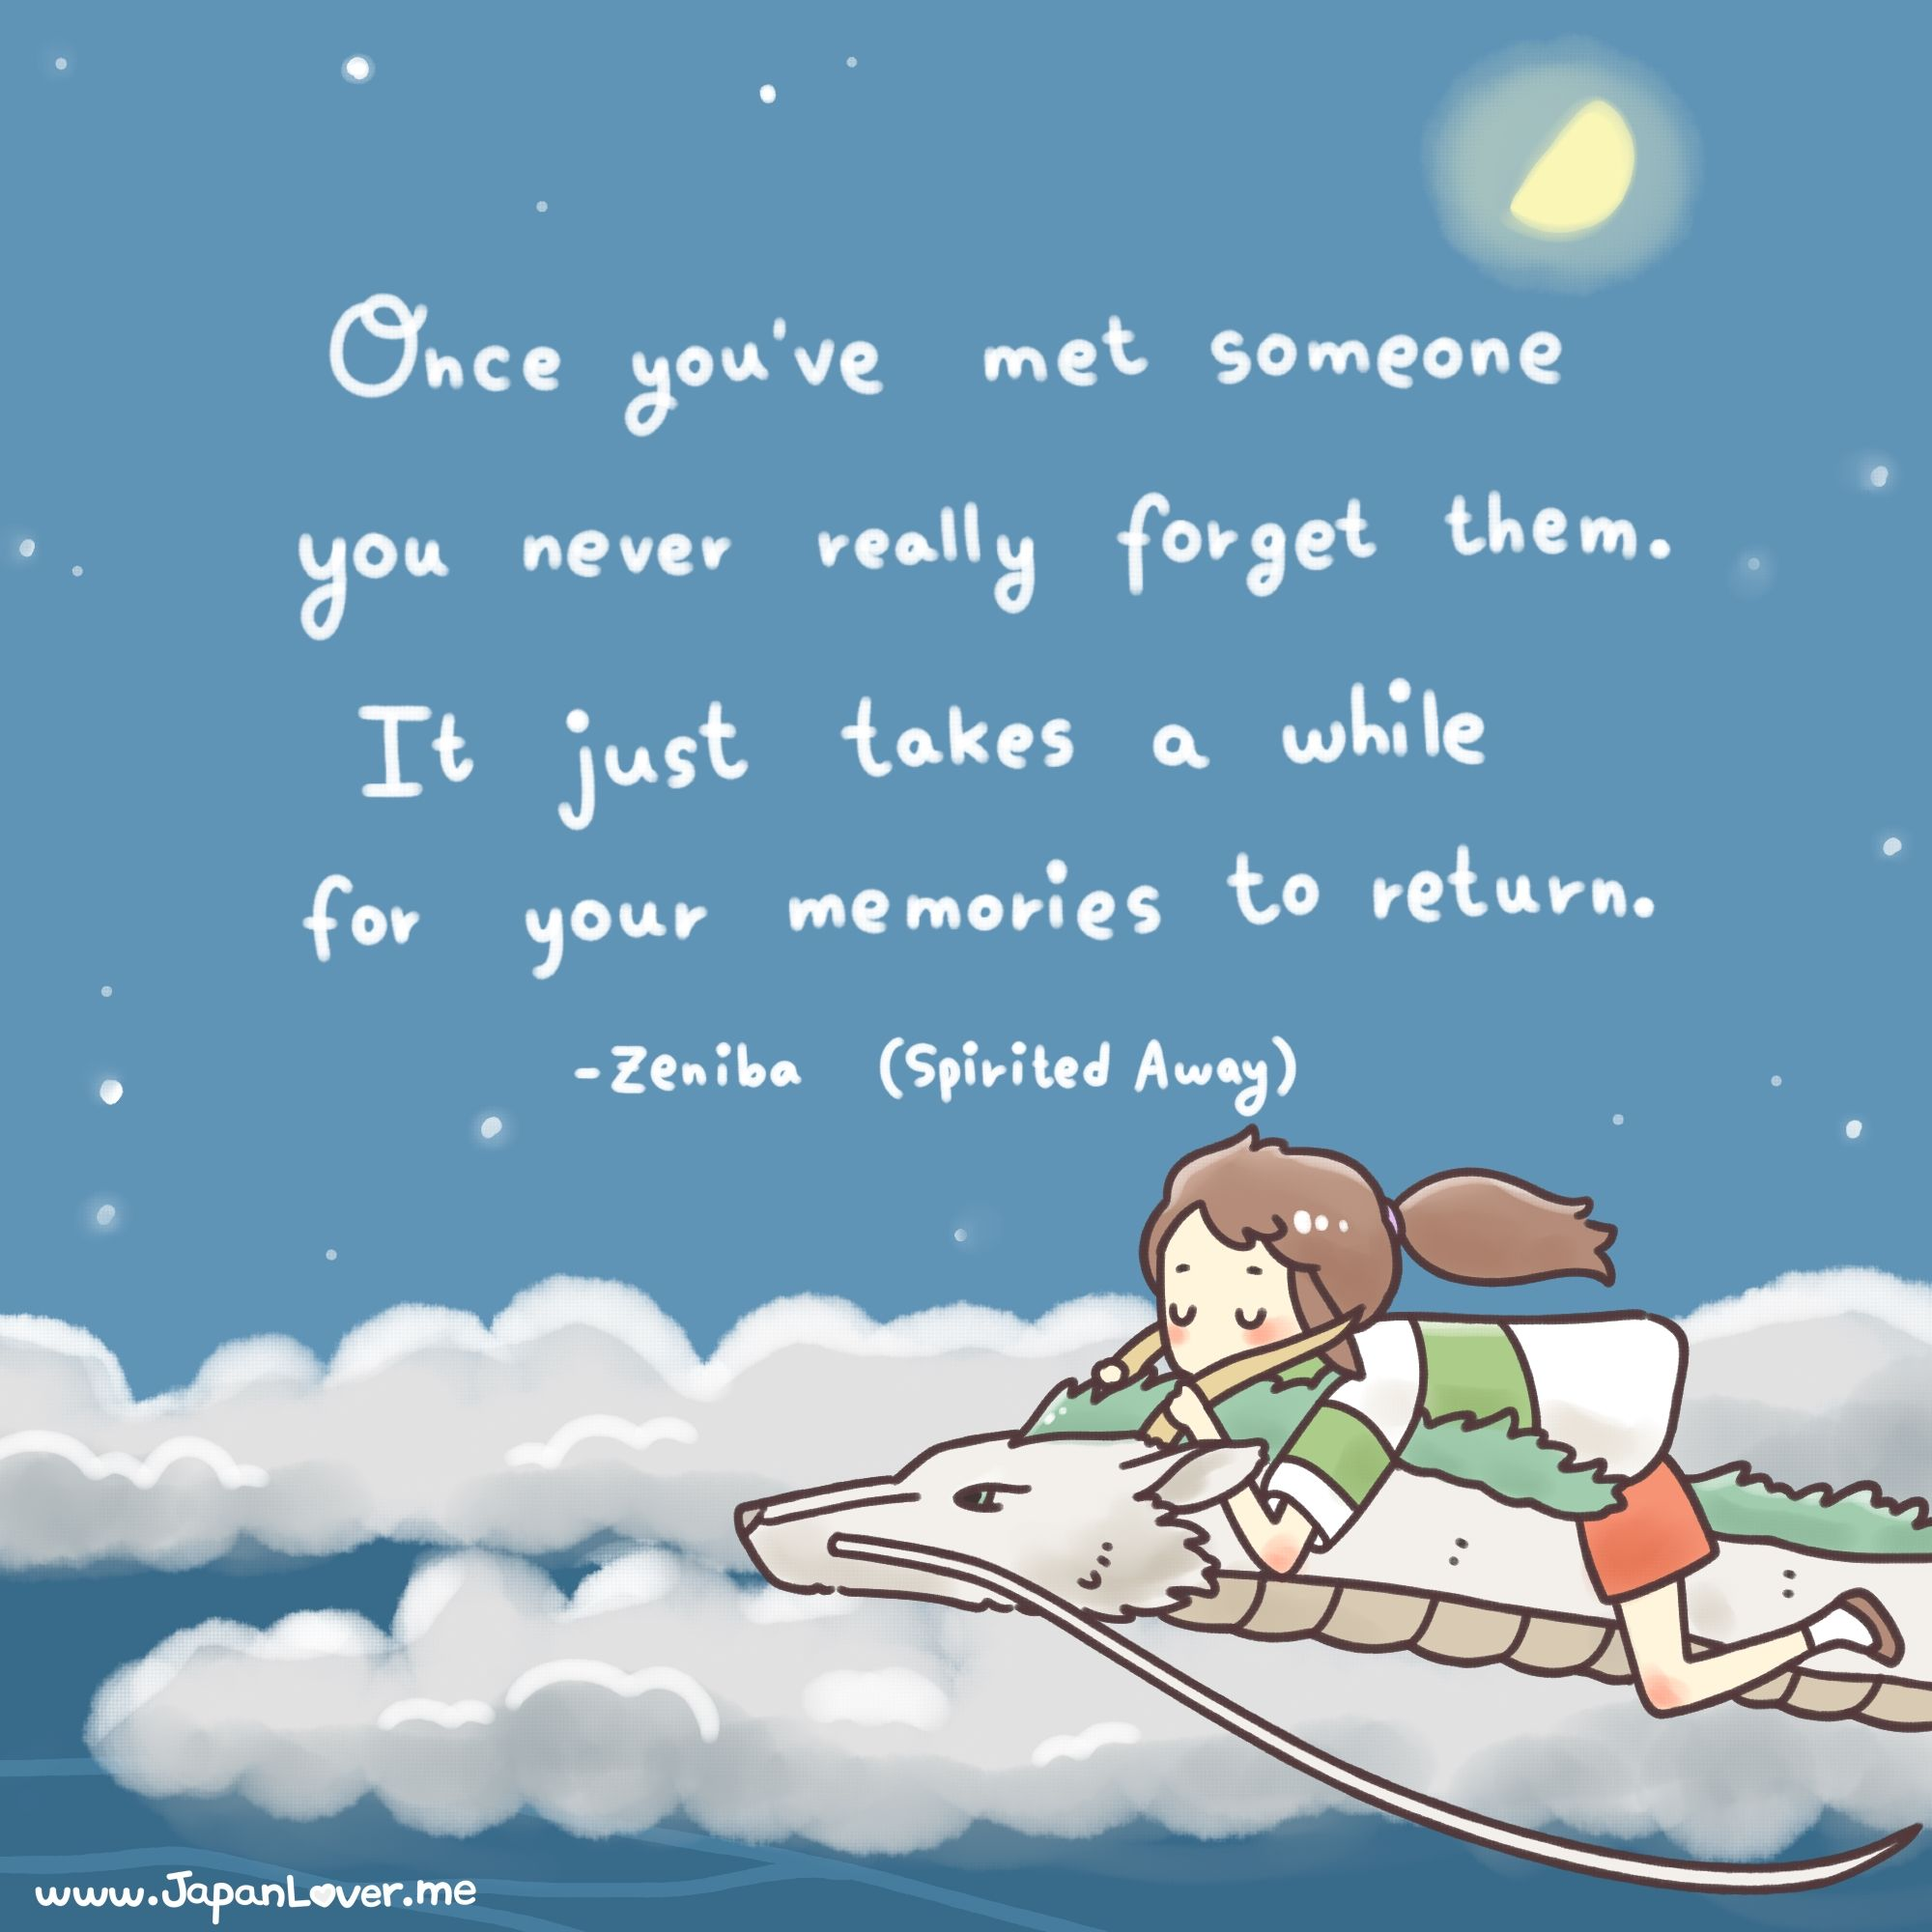 Studio Ghibli quote from Spirited Away Studio Ghibli Love!